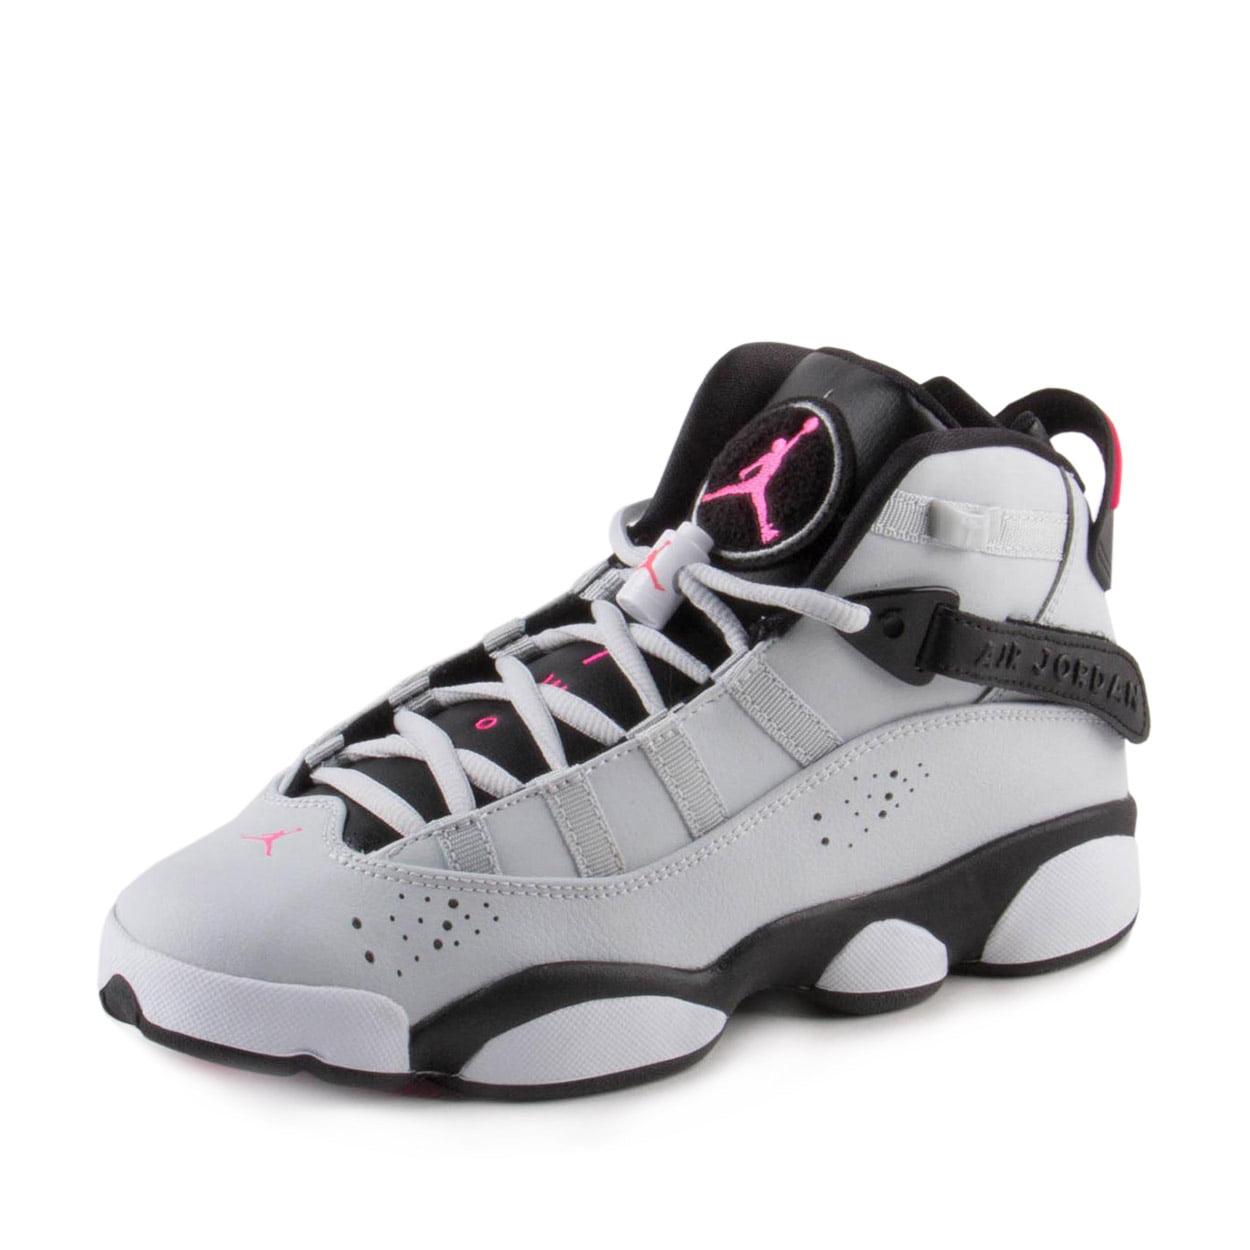 698f71ae9b04 ... Kids Air Jordan 6 Rings GS Pure Platinum Hyper Pink Black White 323399  - Walmart.